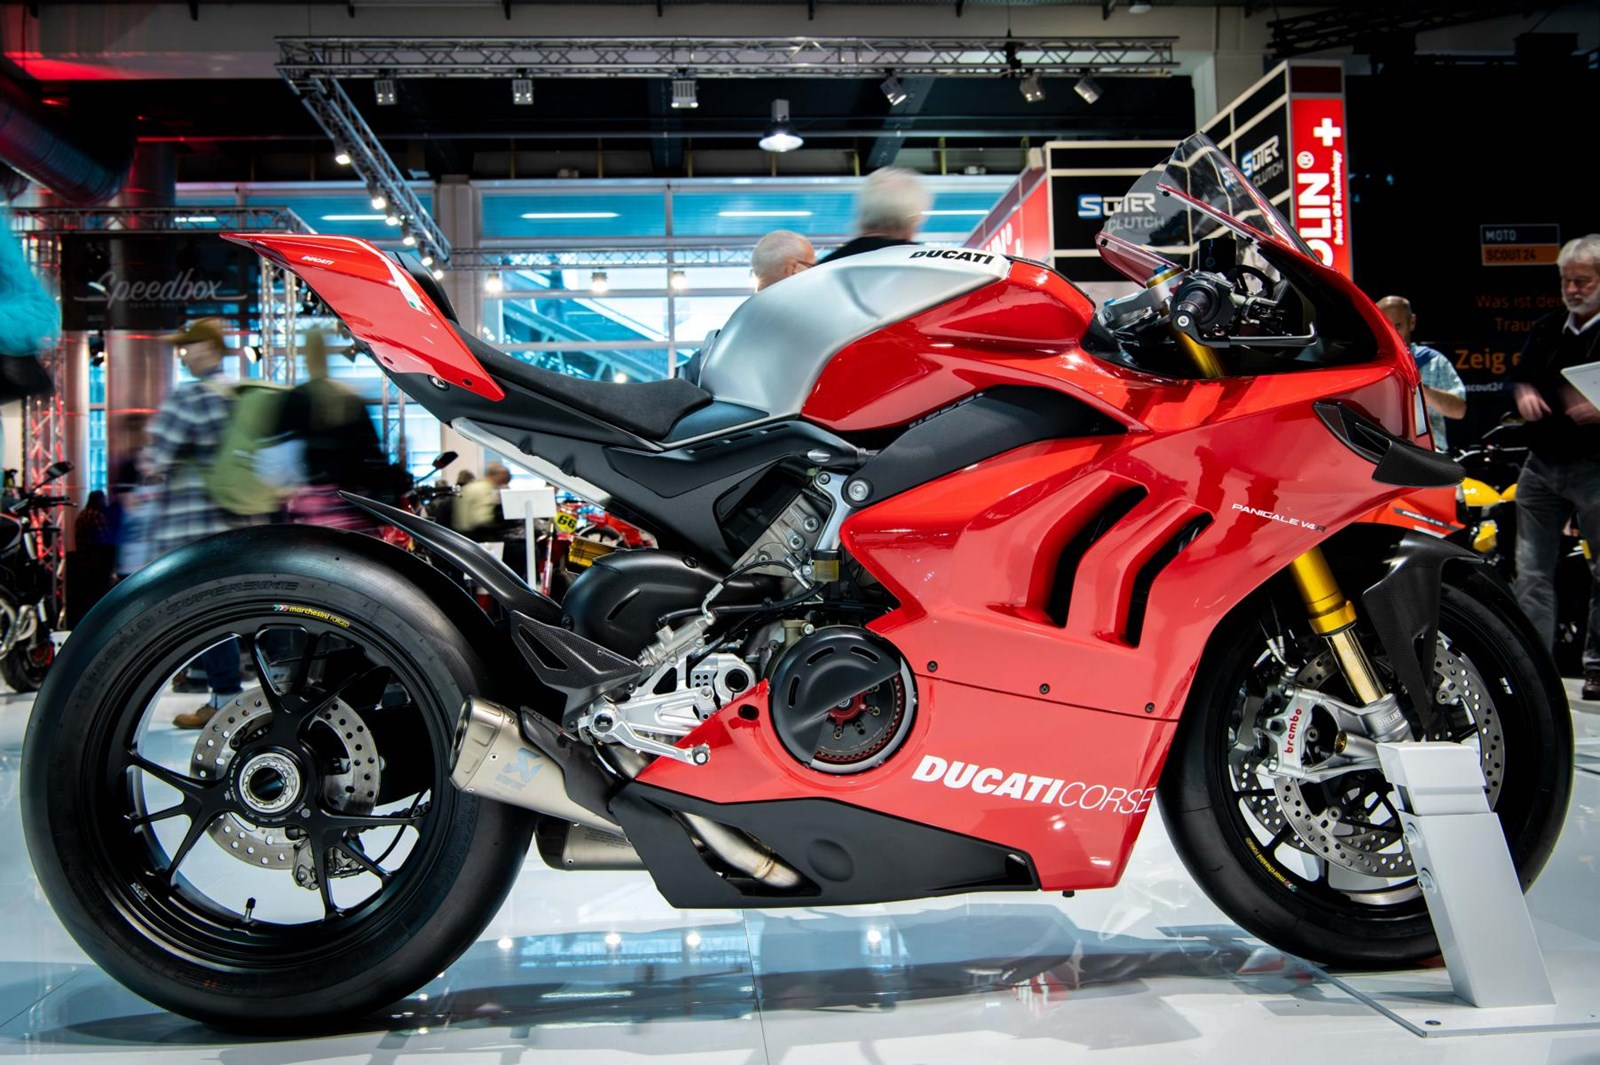 Ducati_Panigale V4 R (4 von 11)-60.JPG